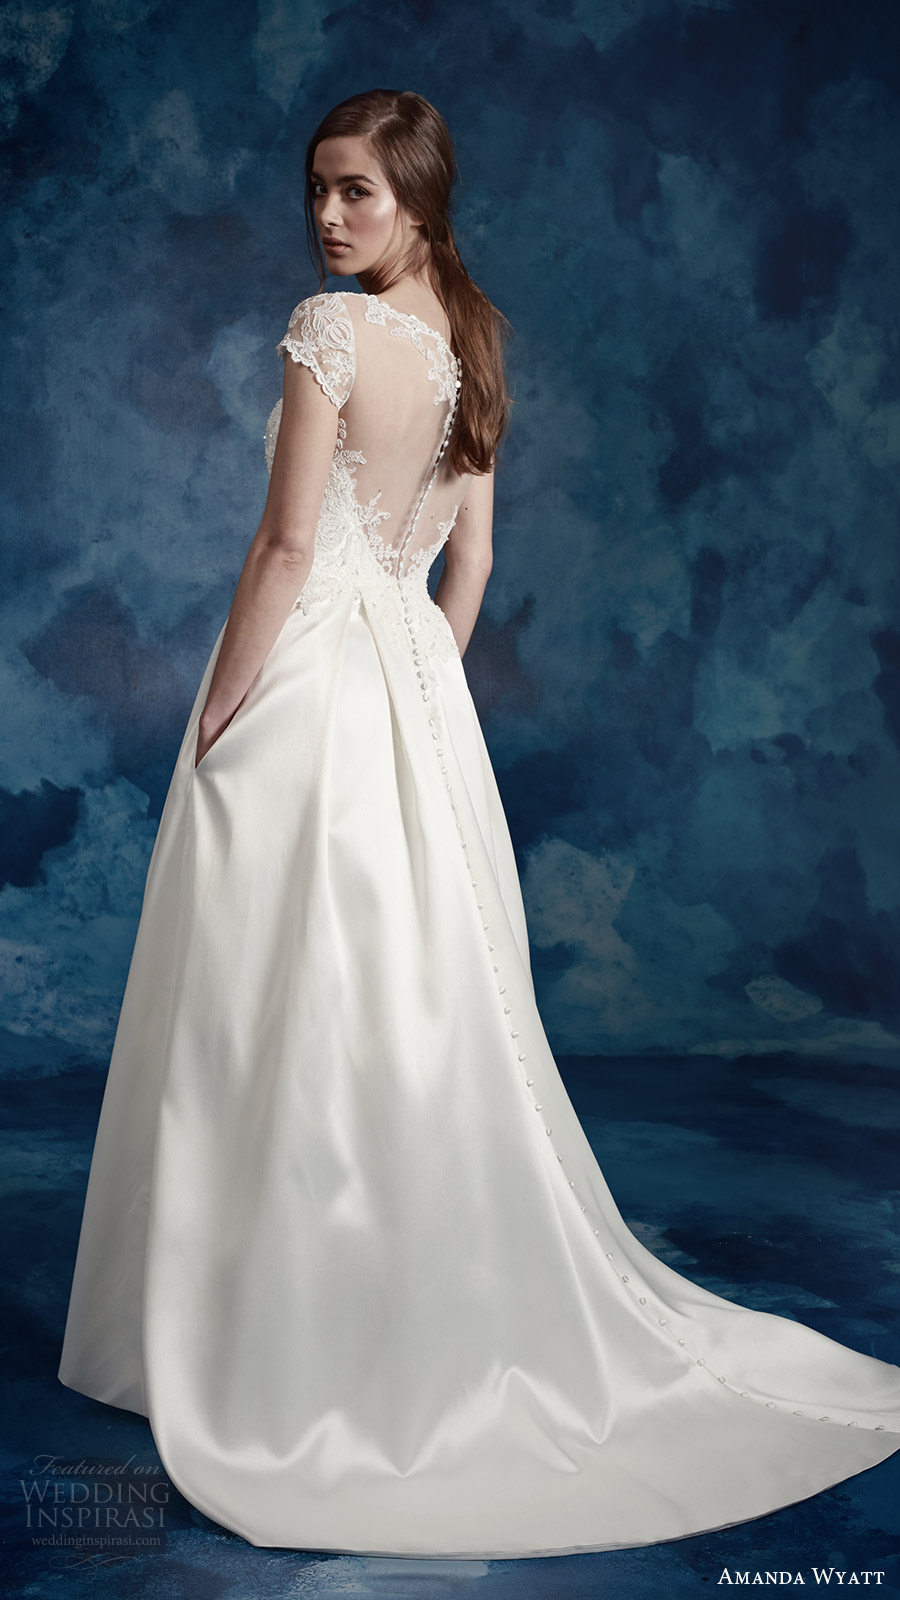 amanda wyatt bridal 2017 cap sleeves sweetheart illusion jewel a line wedding dress (wren) bv pockets train illusion back romantic